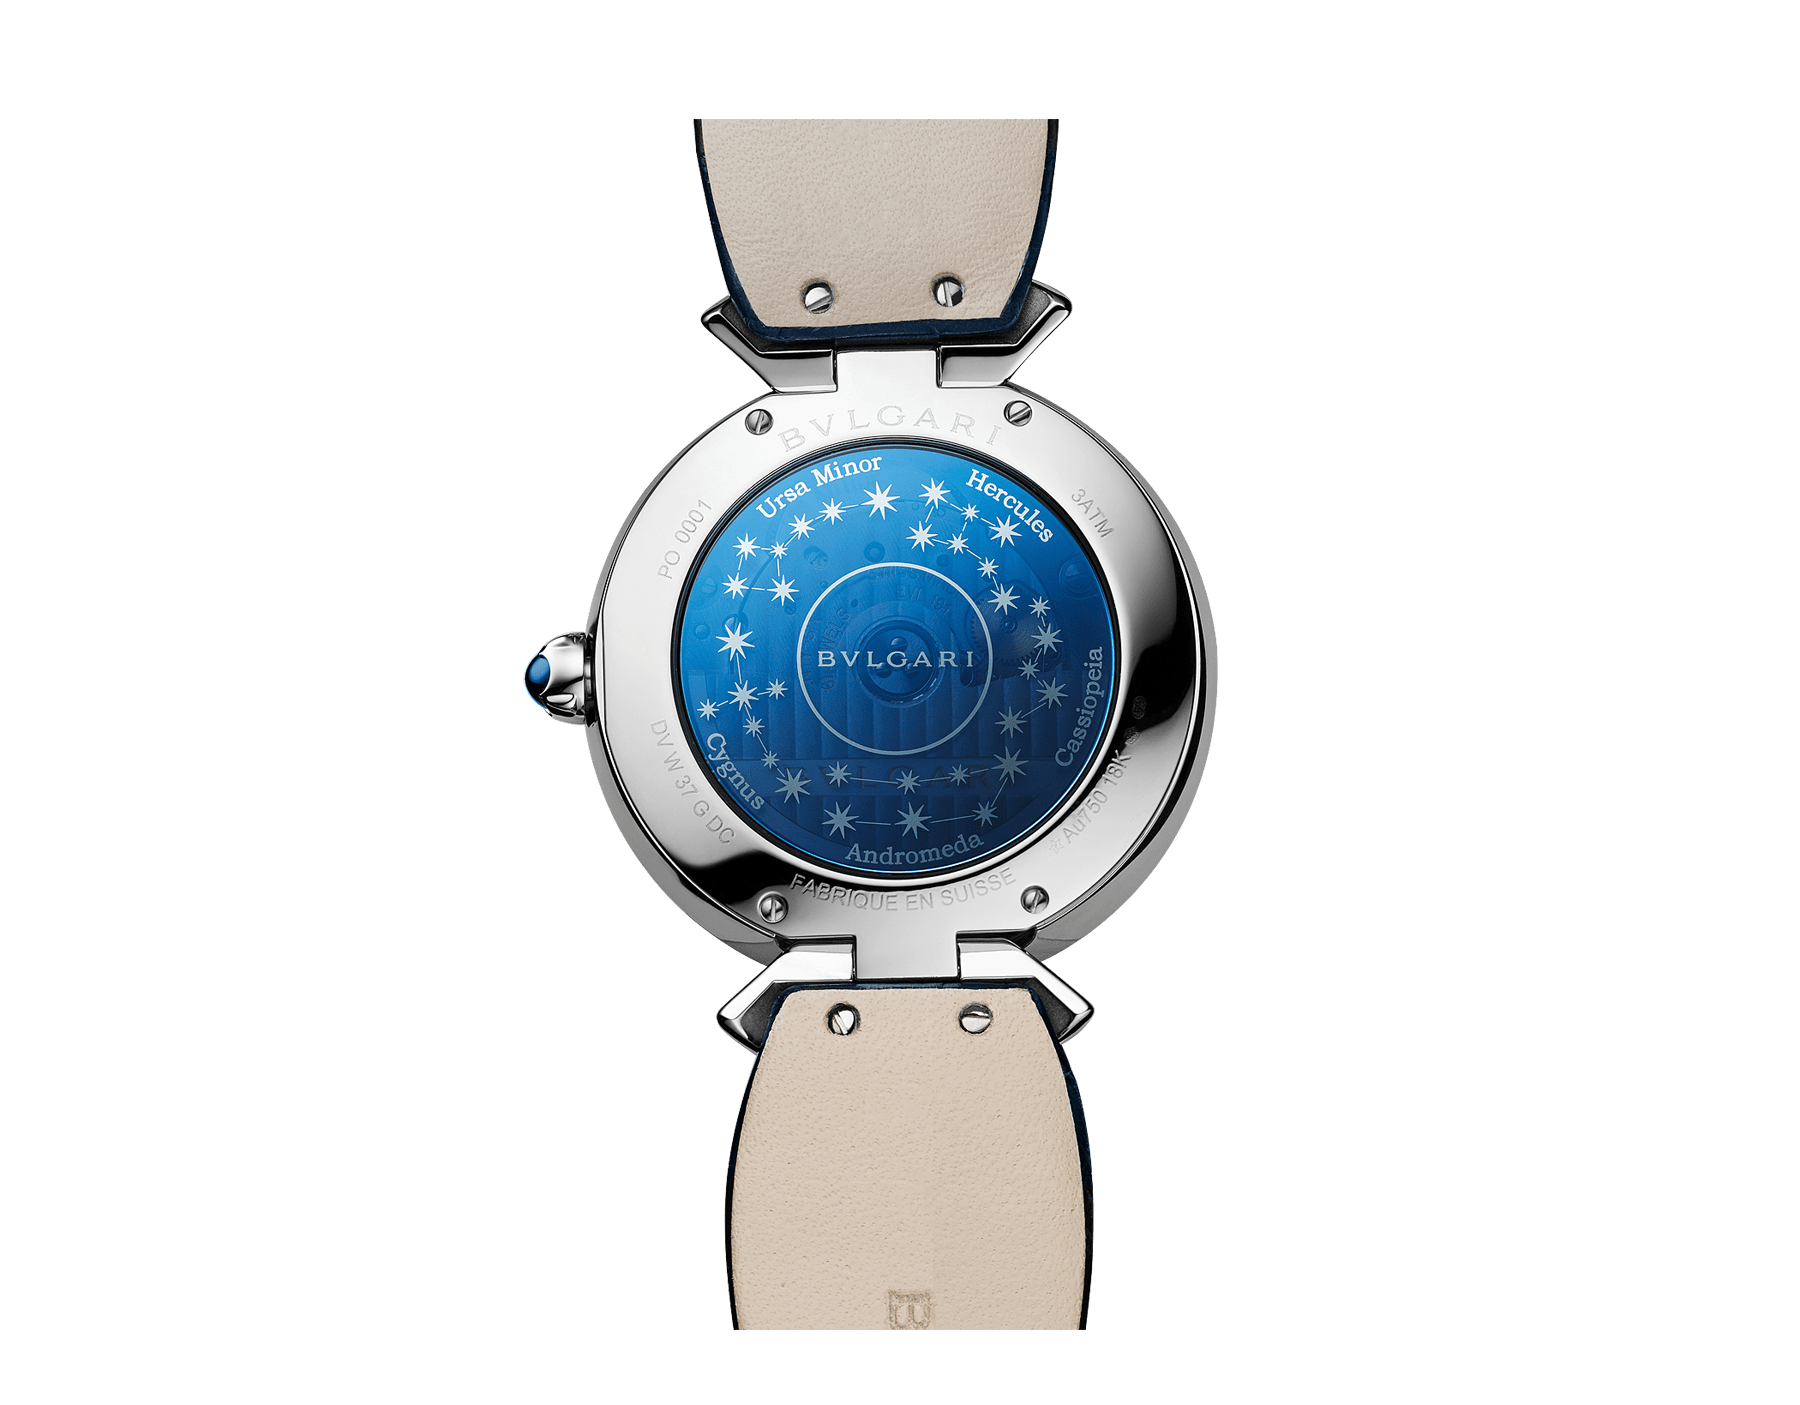 DIVAS' DREAM腕表,搭载品牌自制的自动上链机械机芯,18K白金表壳,镶嵌圆形明亮式切割钻石和蓝宝石,砂金石旋转表盘镶嵌钻石,并饰以星座图案,深蓝色鳄鱼皮表带 102842 image 3